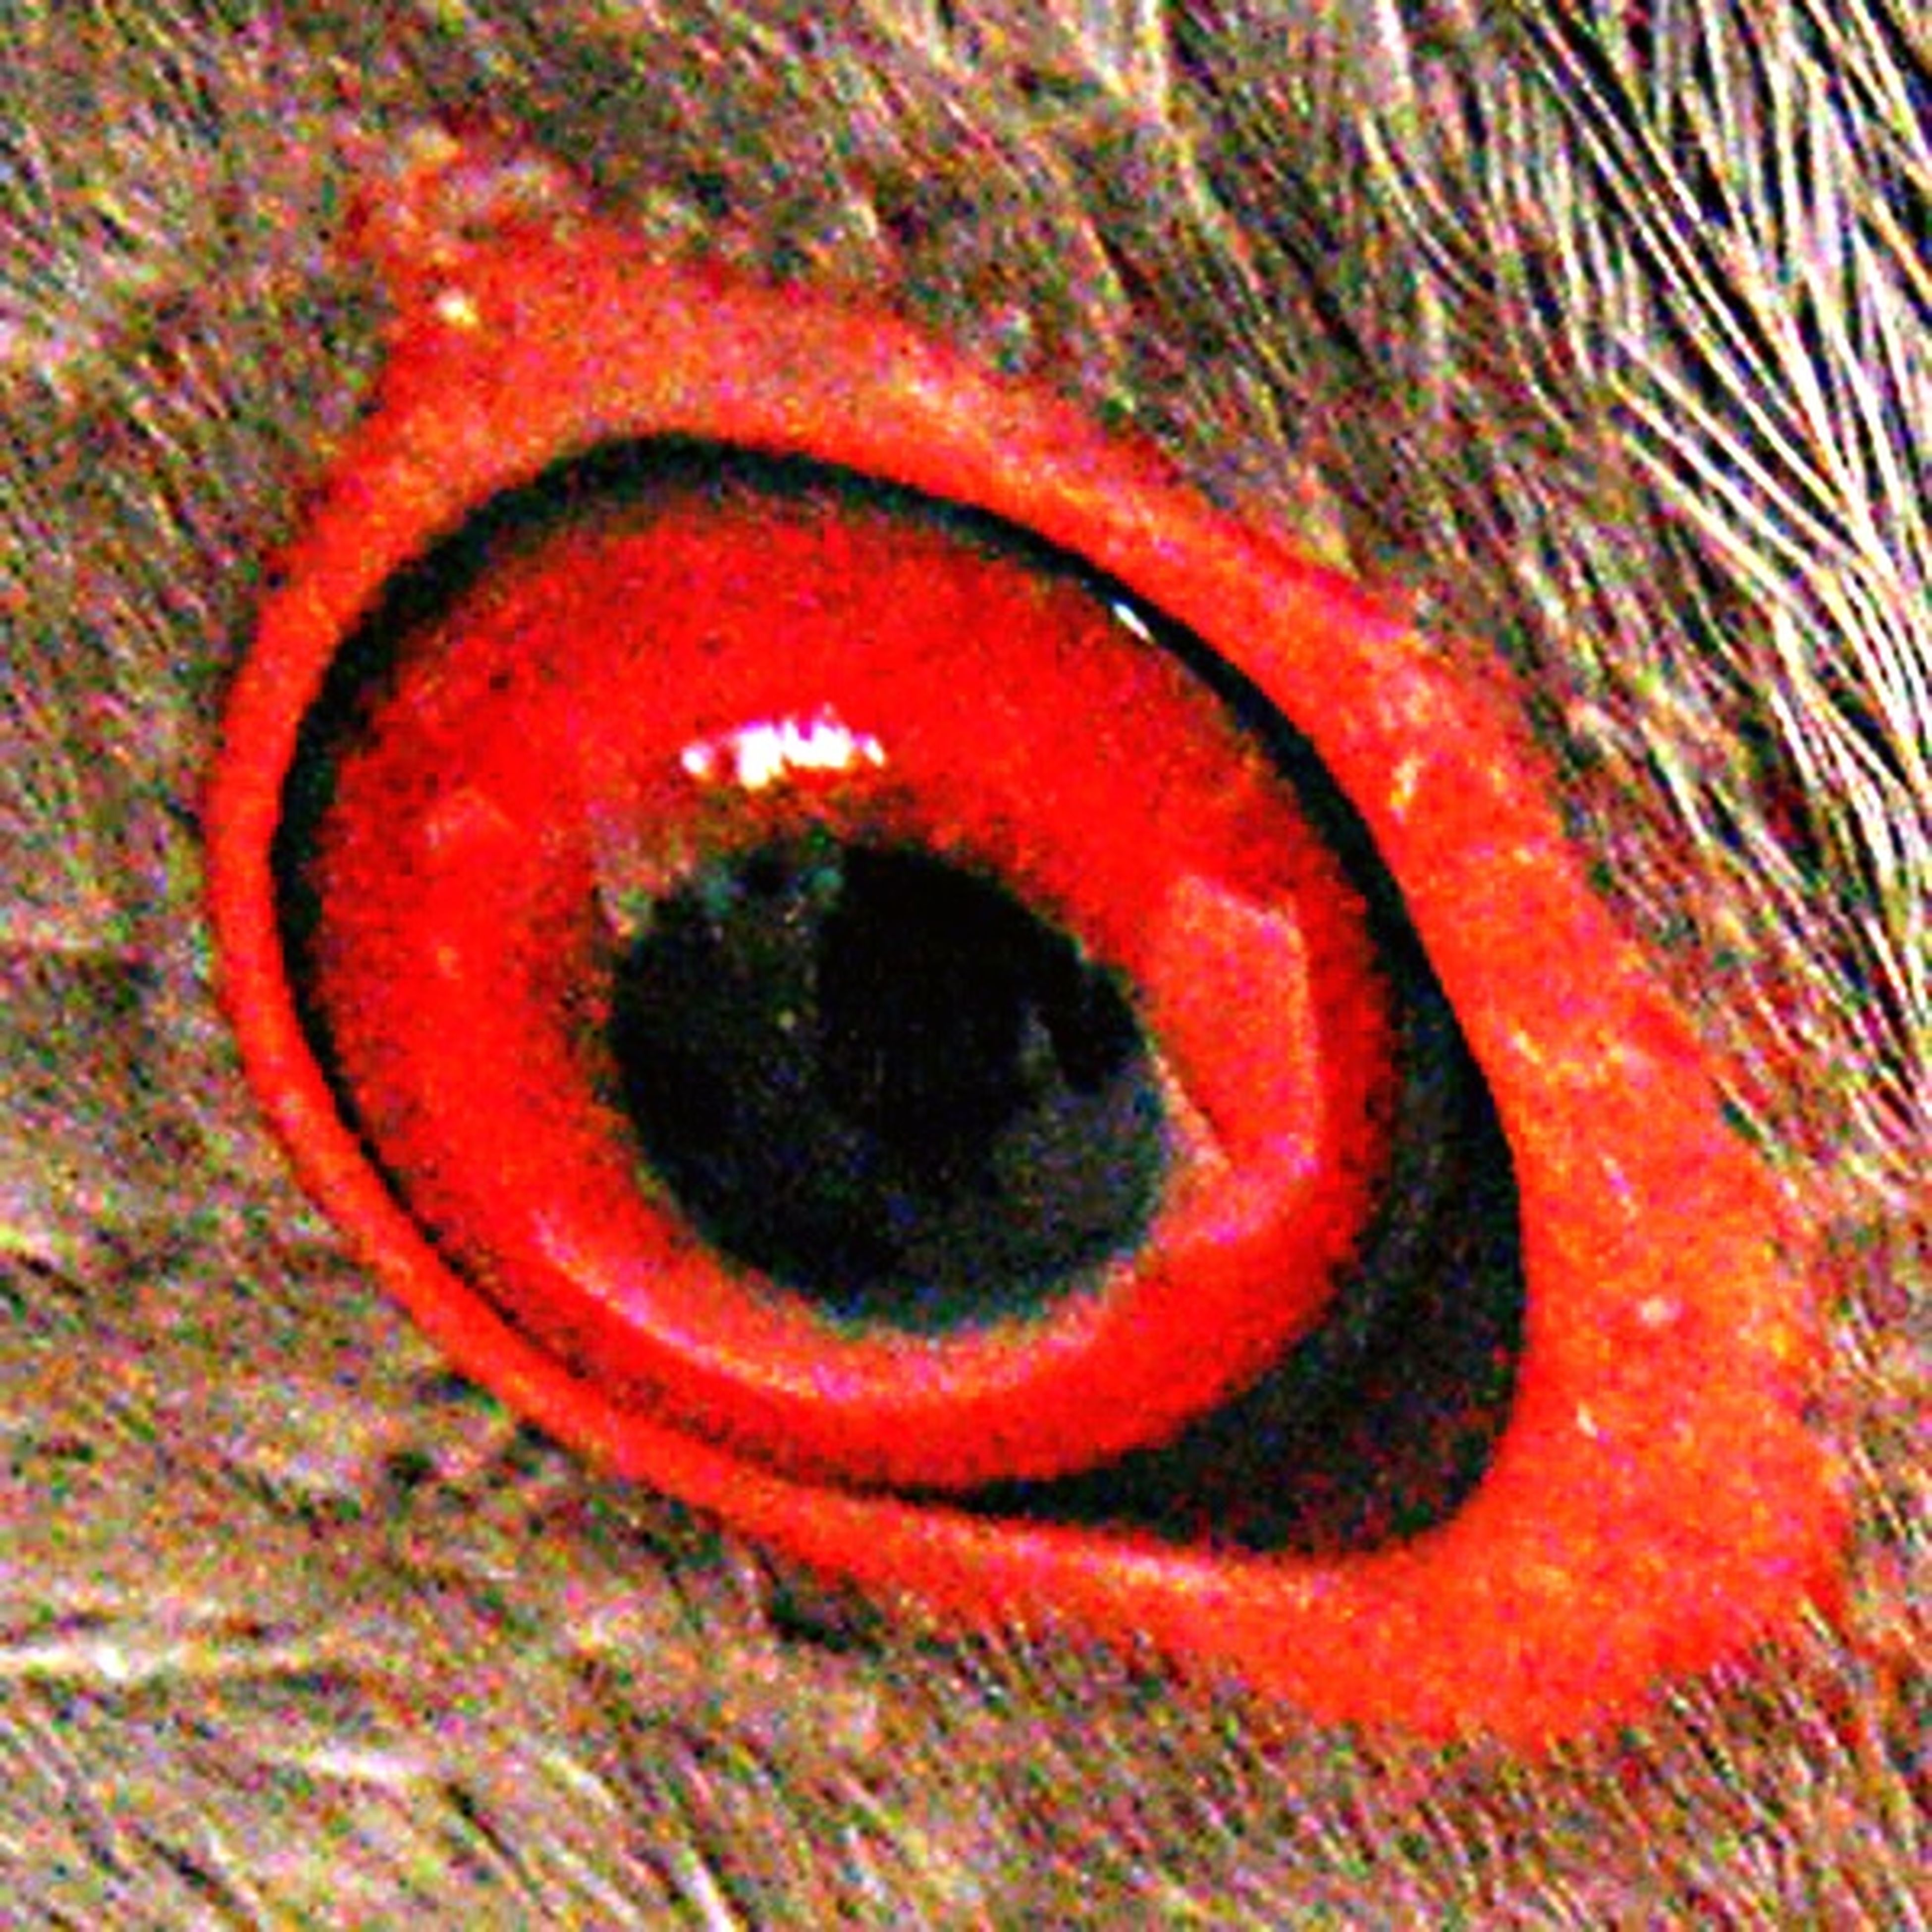 Eye Chirrincoco Eye Nature Nature Photography bird Birds Bird Photography Bird Watching Look DetailofChirrincoco San Vito, Costa Rica Costa Rica Red Eye